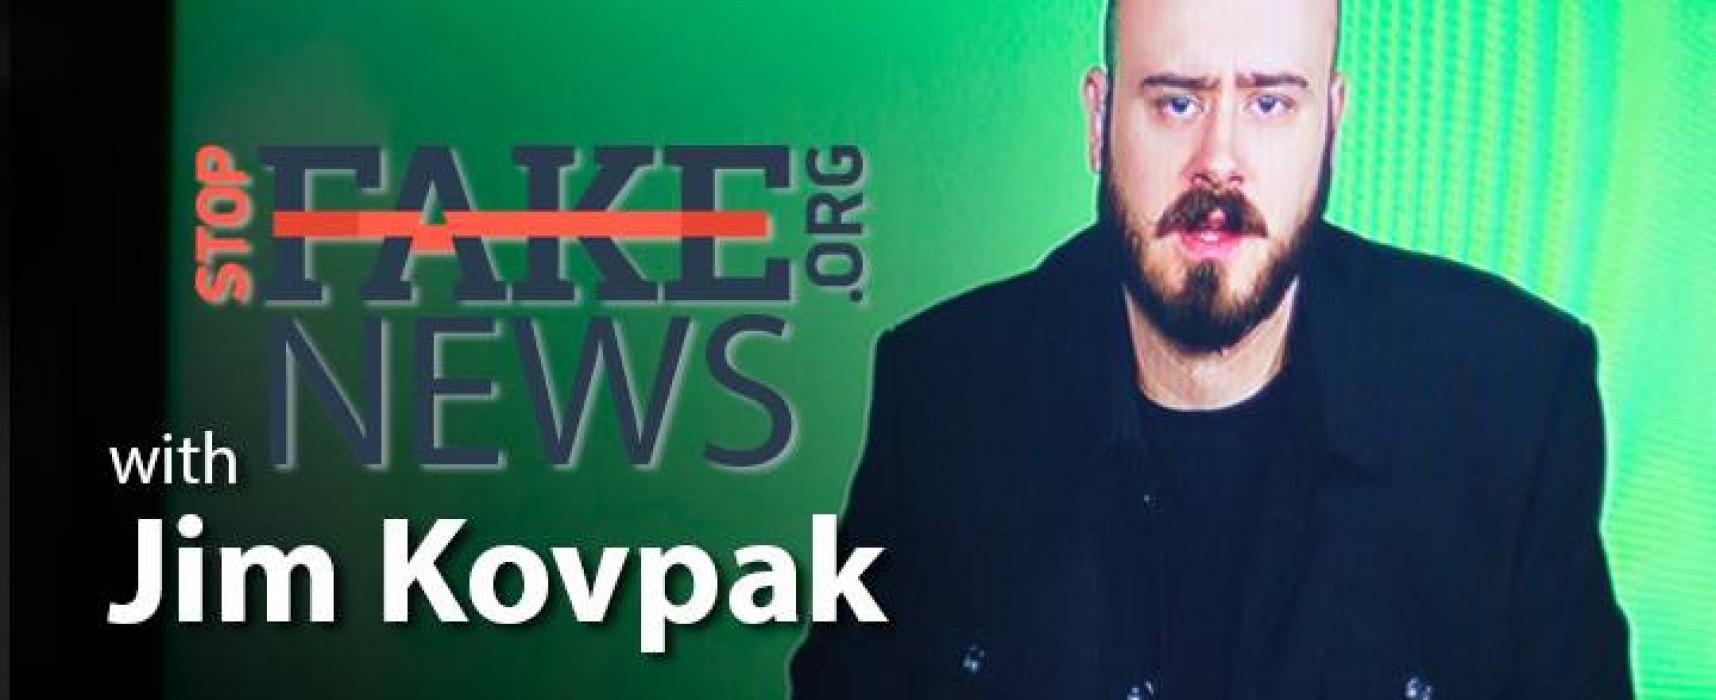 StopFakeNews #54 [ENGLISH] with Jim Kovpak